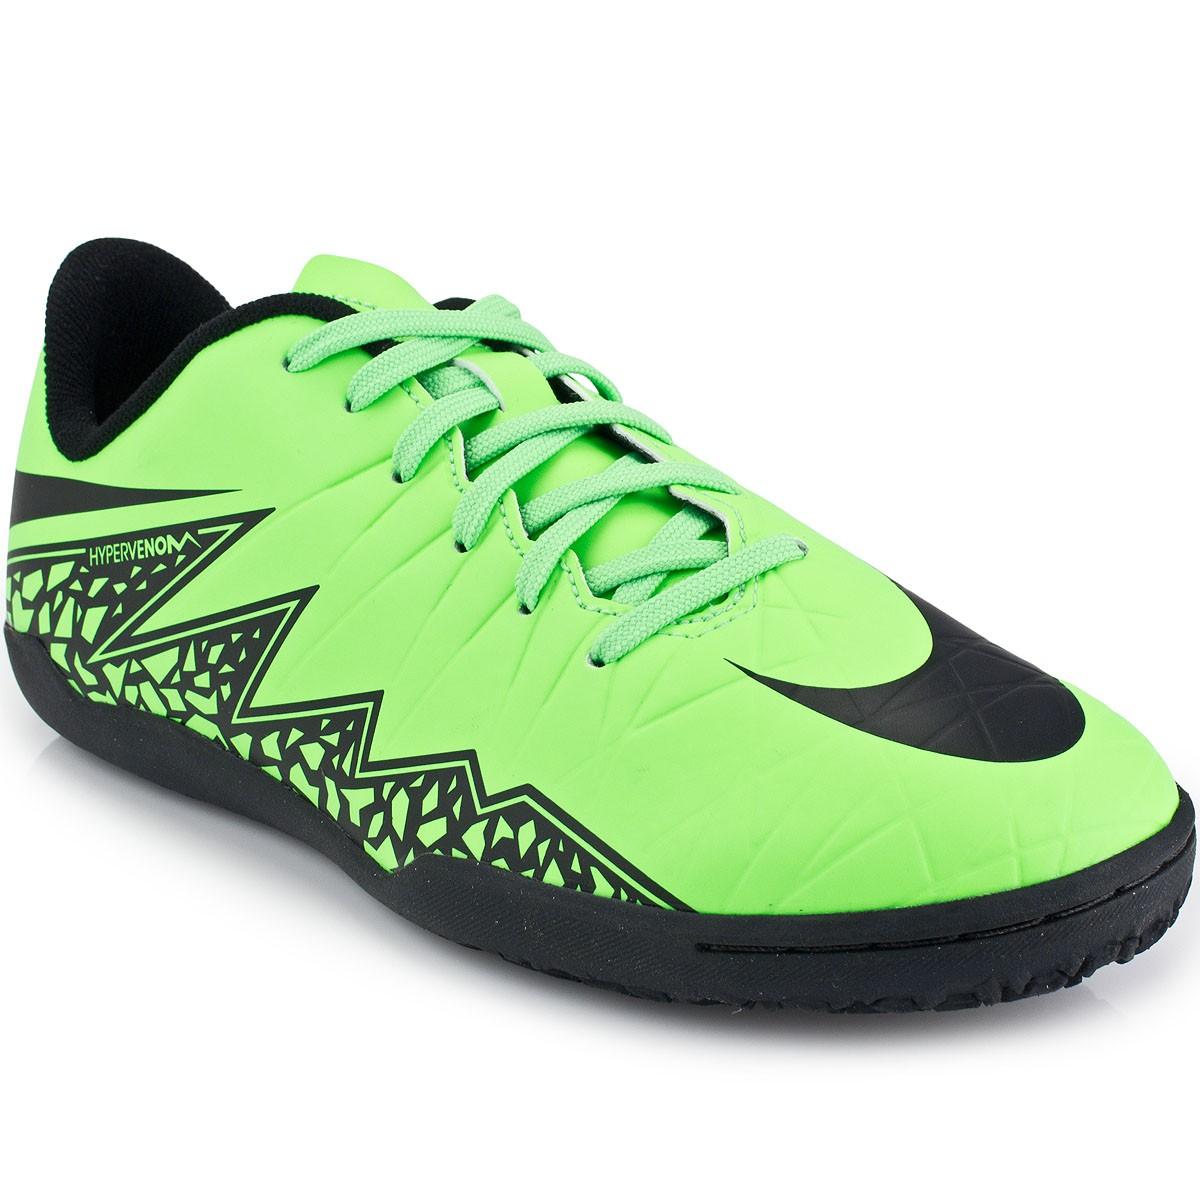 Chuteira Nike Hypervenom Phelon II IC Jr  9cd34be3b8e7d